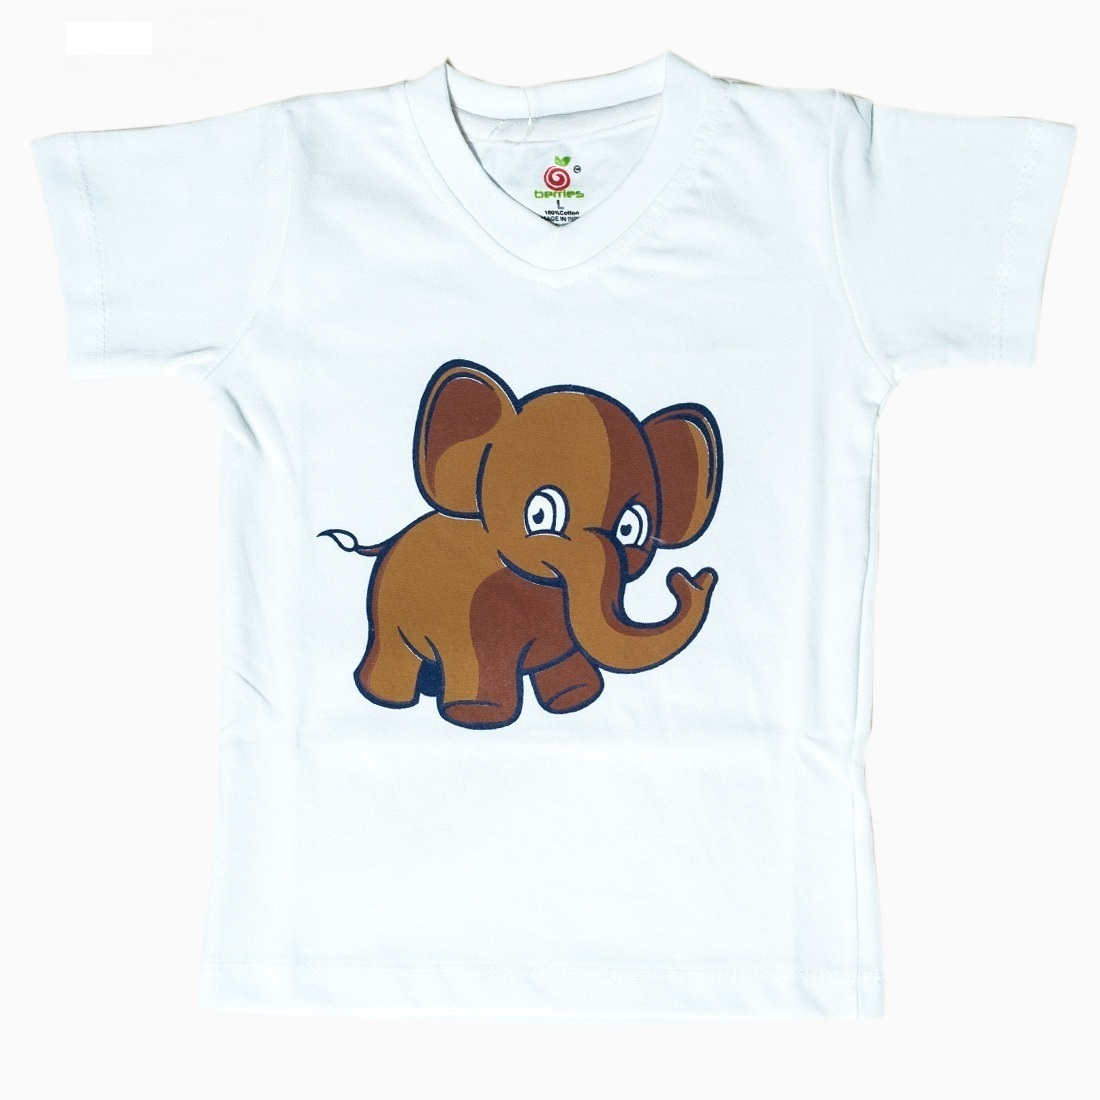 ELEPHANT PRINT DESIGN White Cotton Kidswear